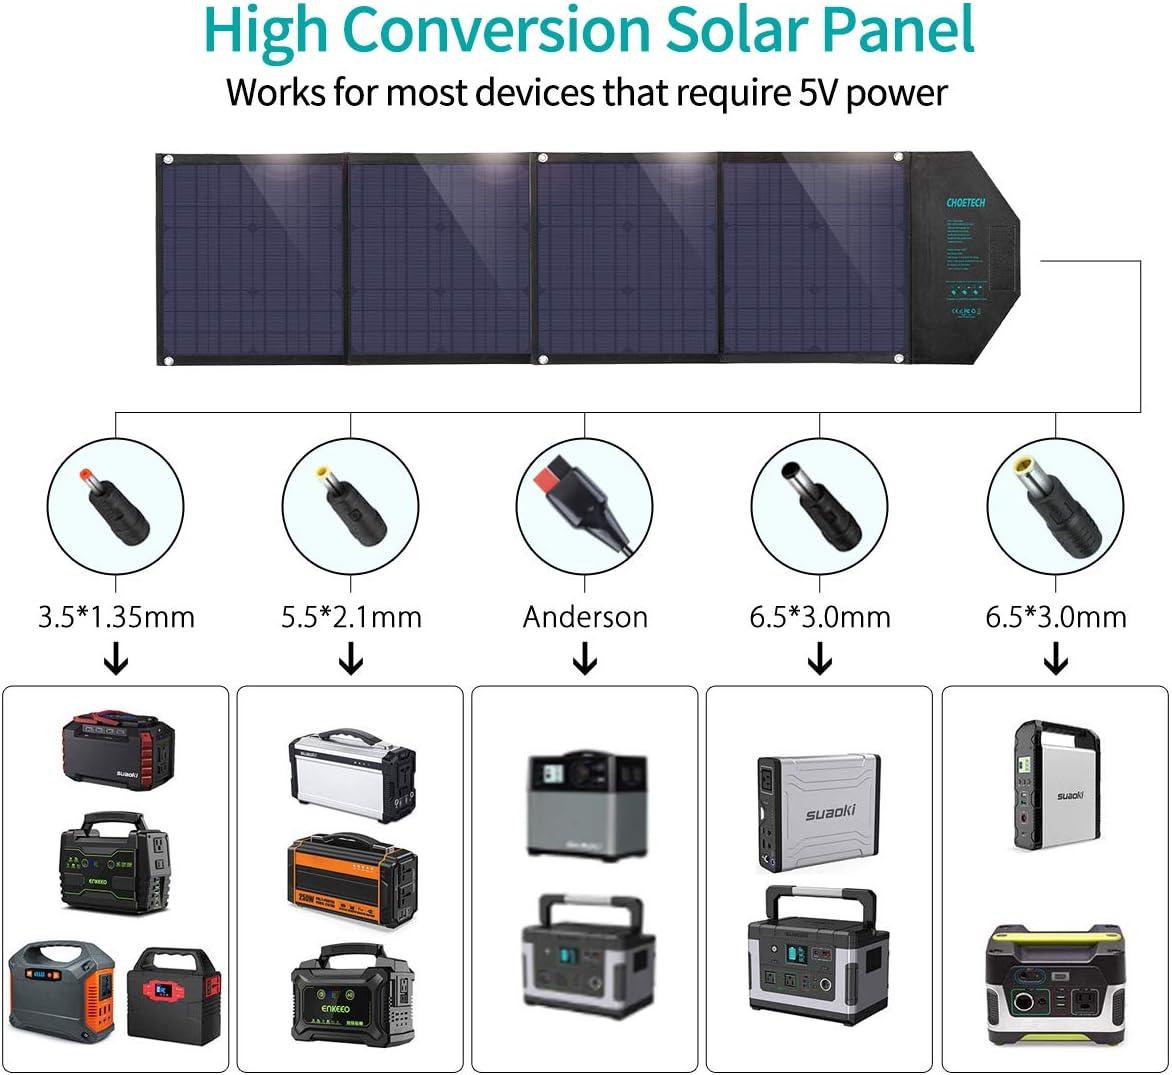 CHOETECH Cargador Solar, Kit Panel Solar Portátil 80W, Plegable Impermeable, PD 30W + QC 18W + USB 12W, Salida de DC 18V para Generador Portátil, ...